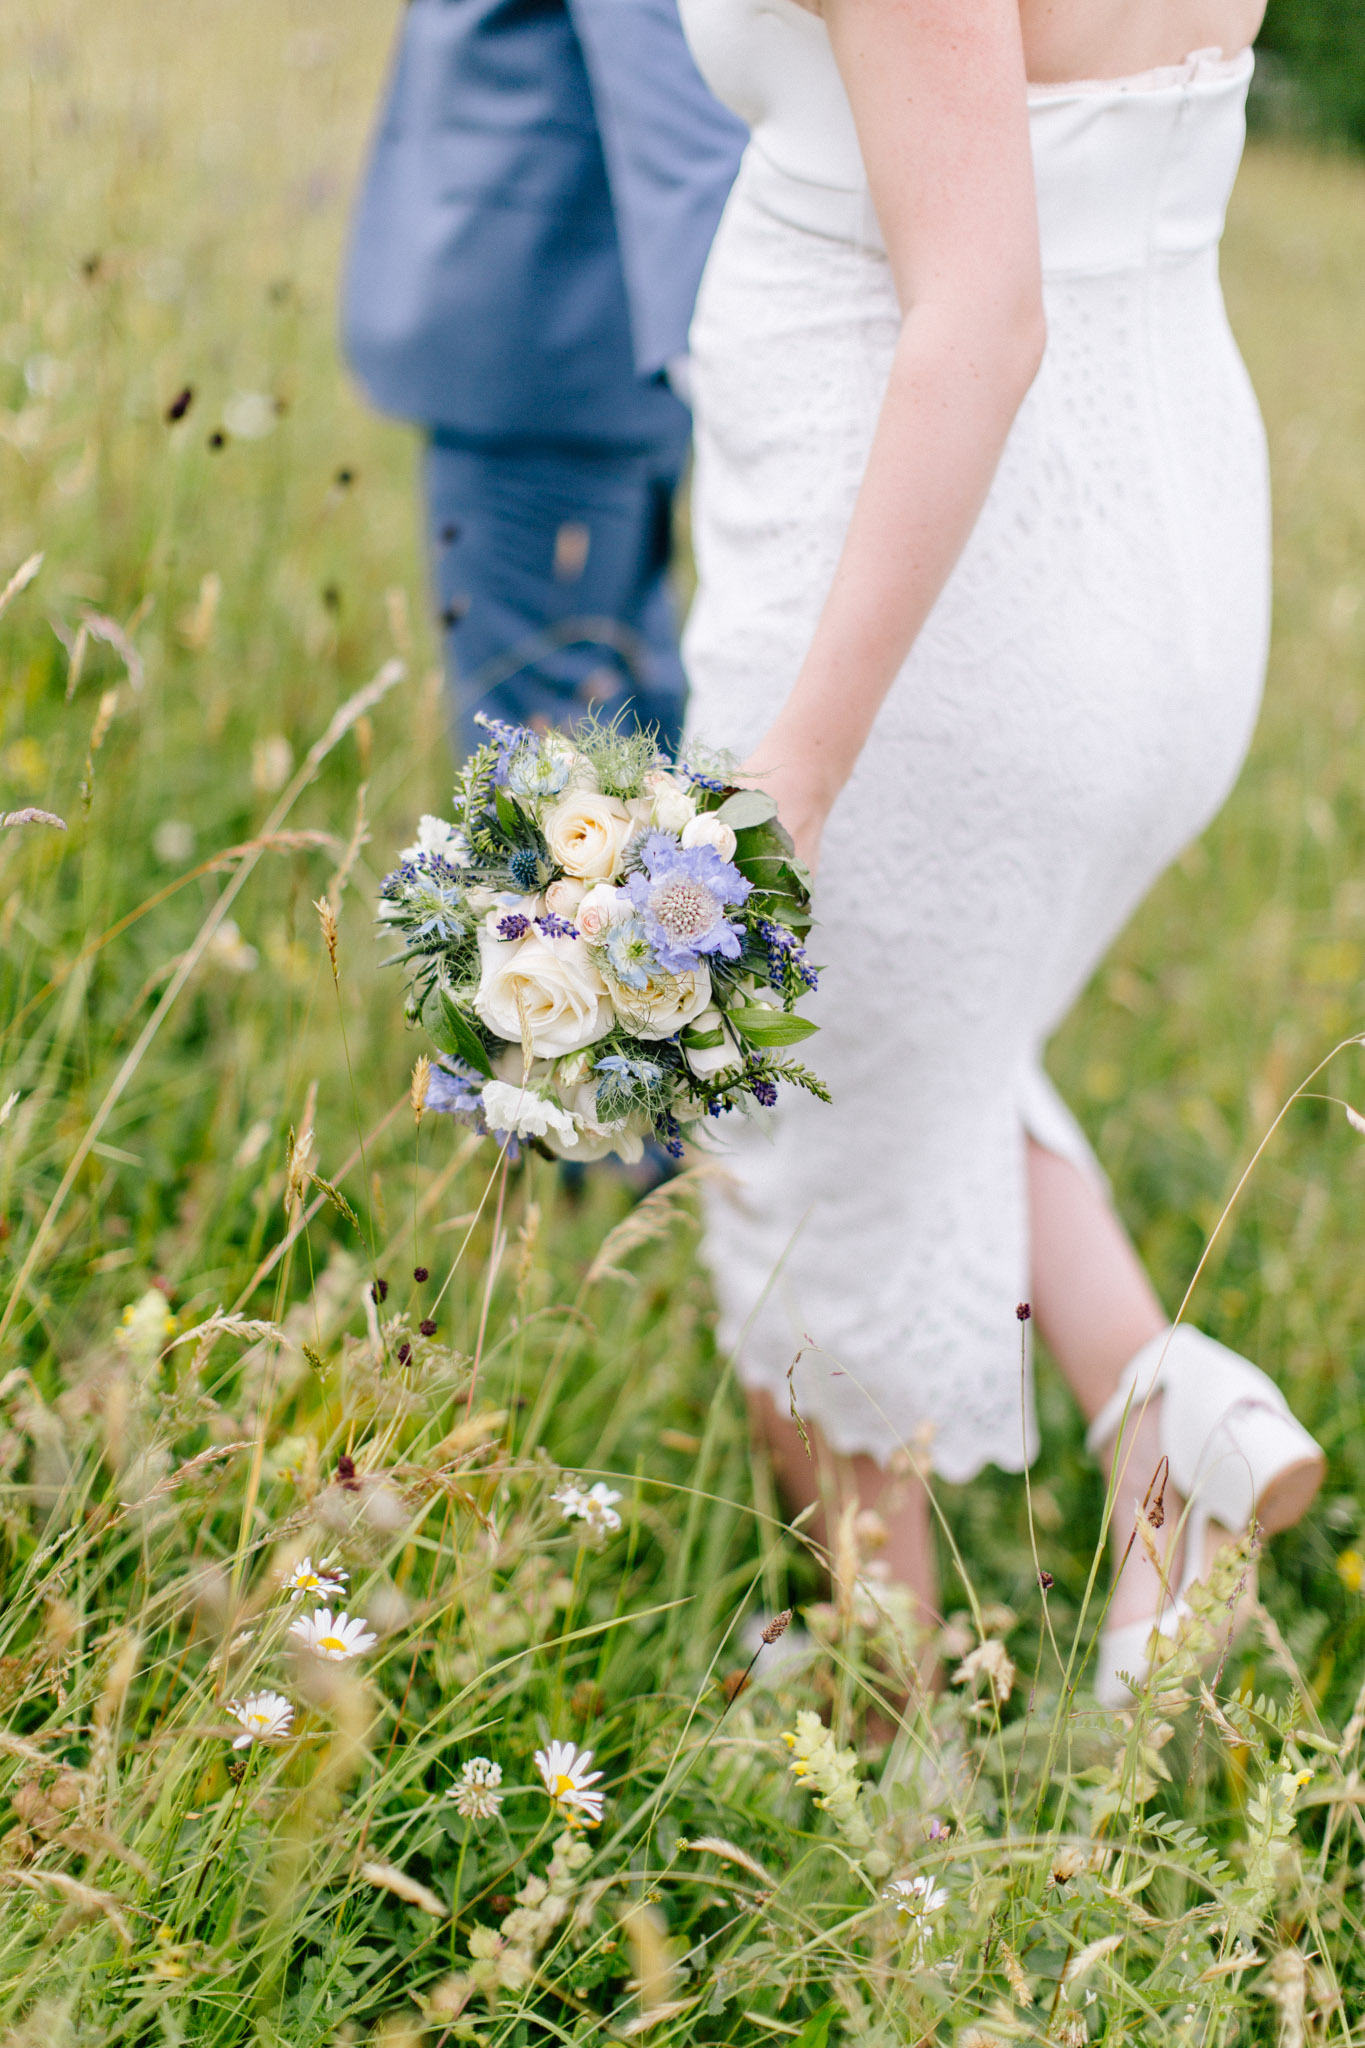 Lenl-Simmental-Buehlerhof-Pia-Anna-Christian-Wedding-Photography-EK-52.jpg